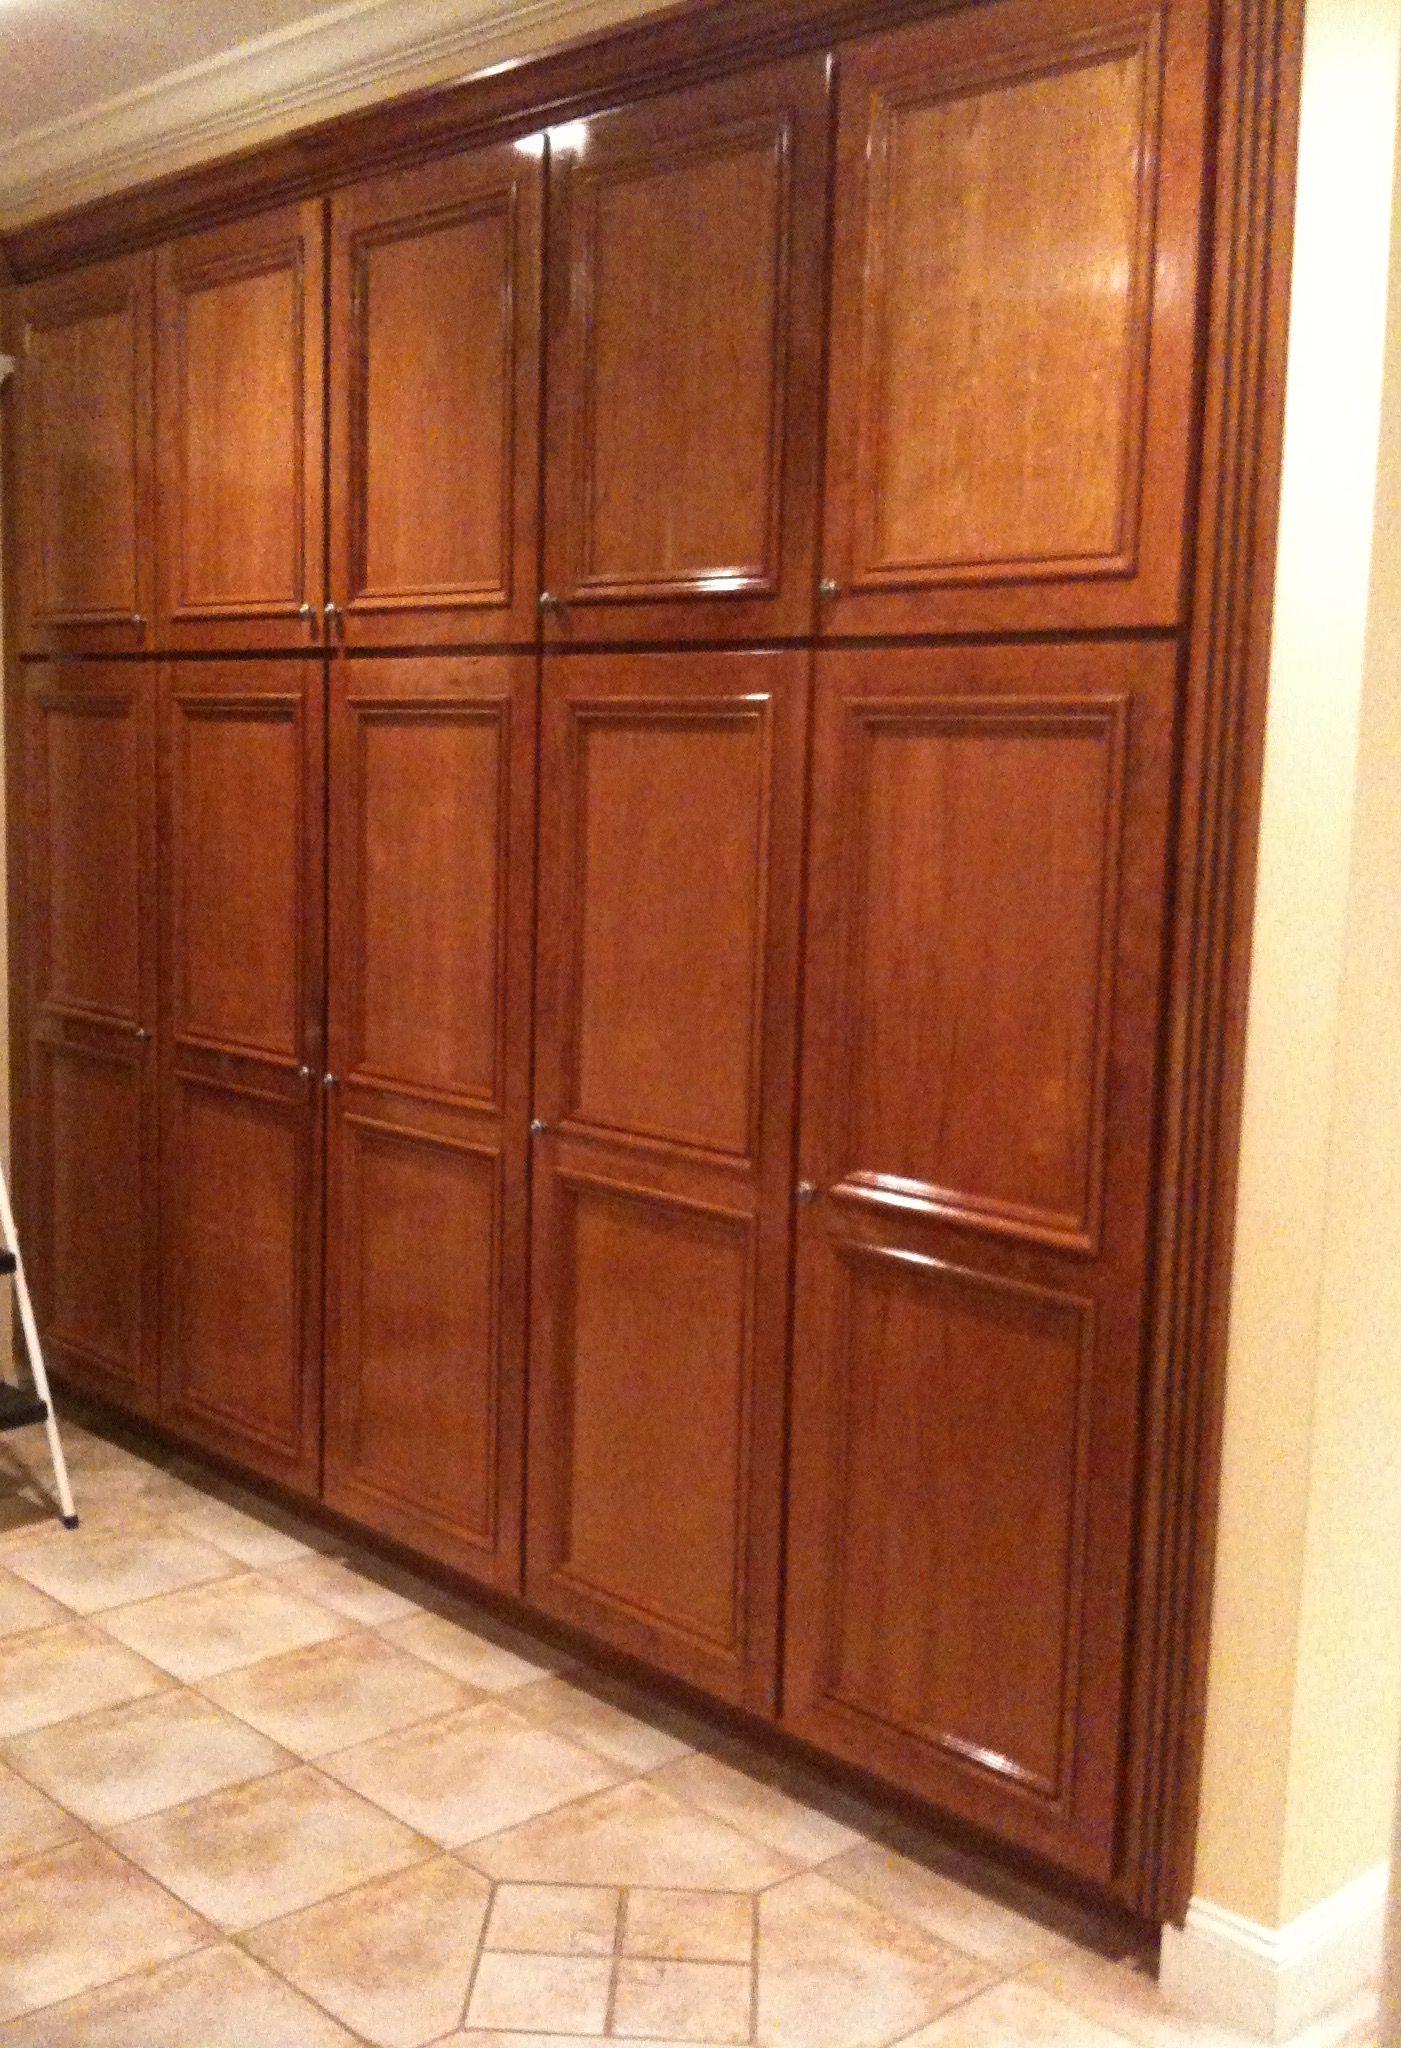 Built in cherry wood pantry